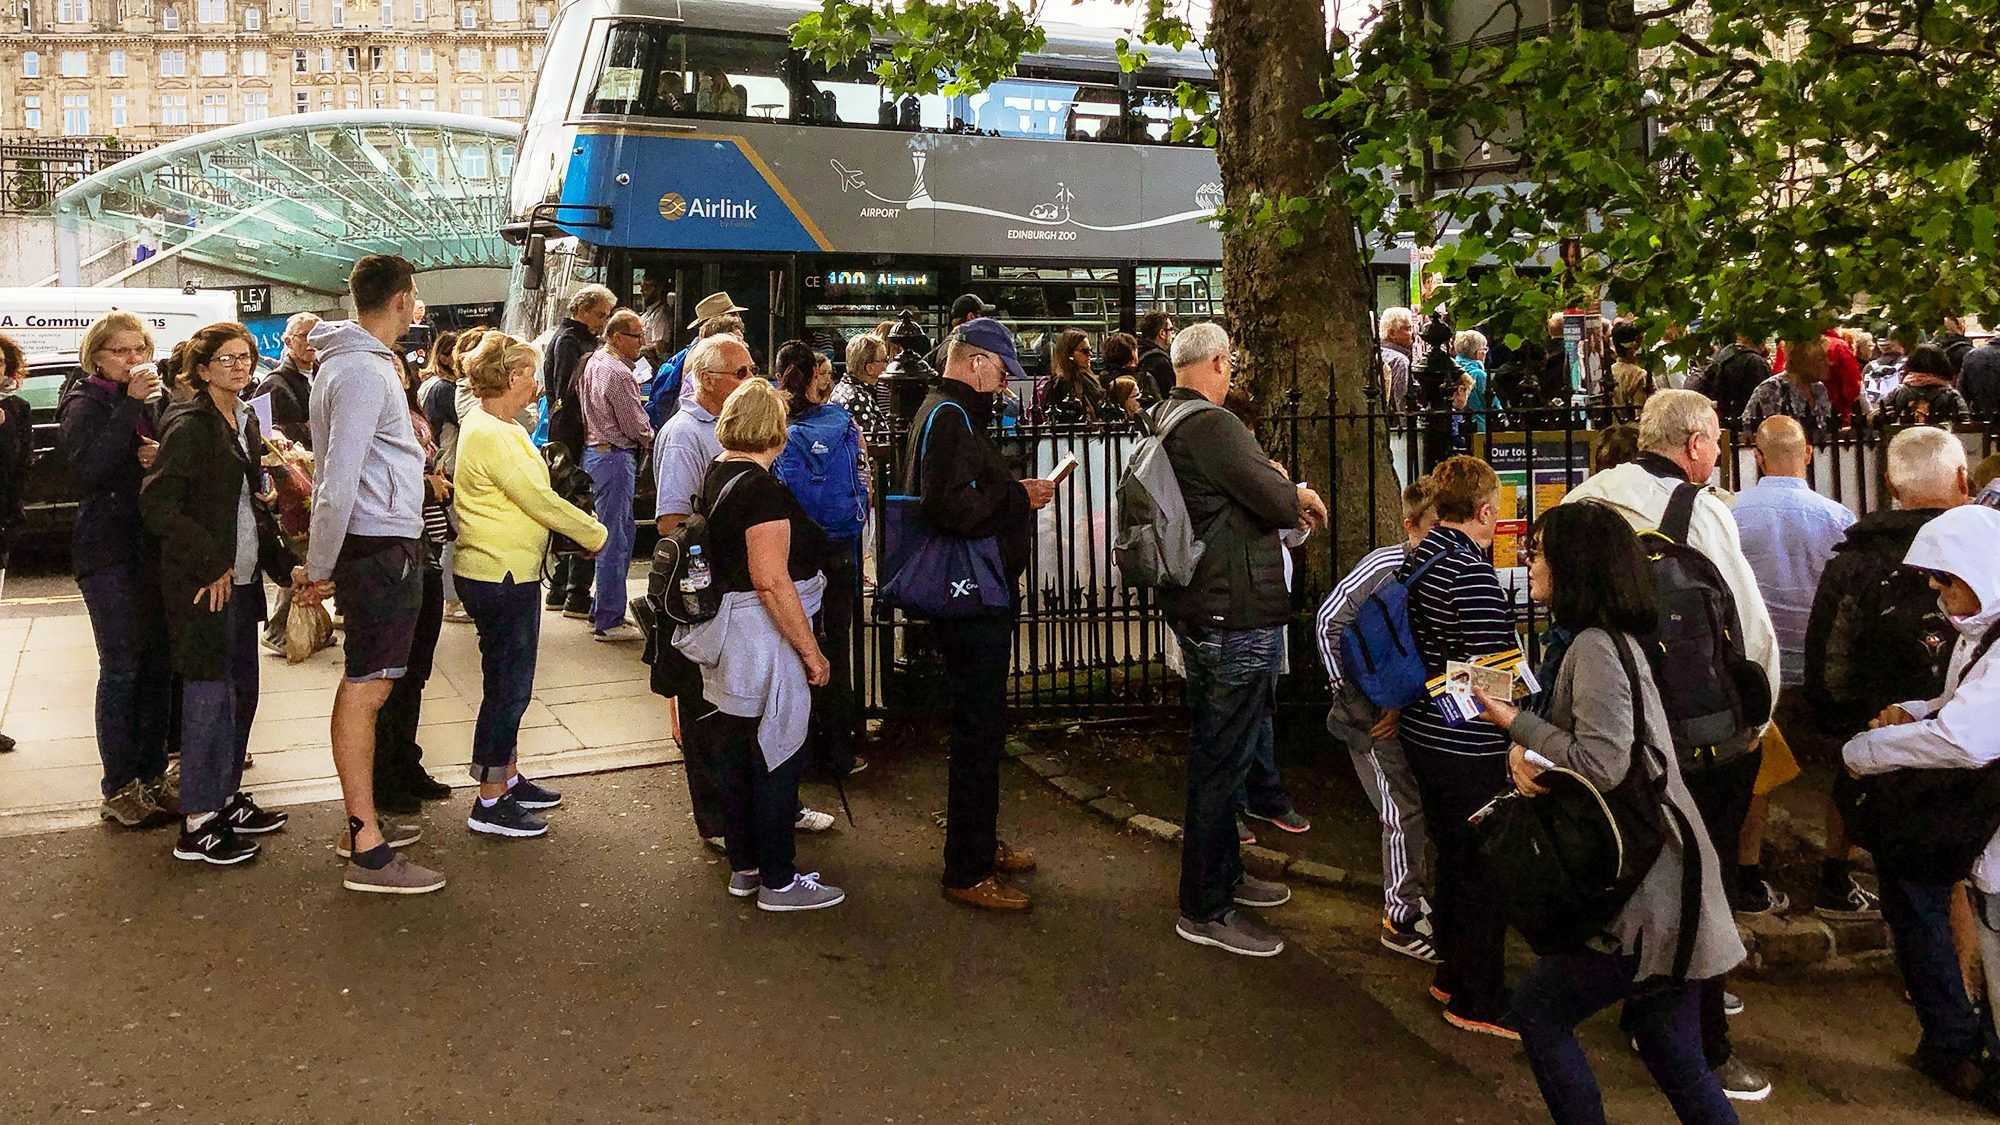 queue of tourists